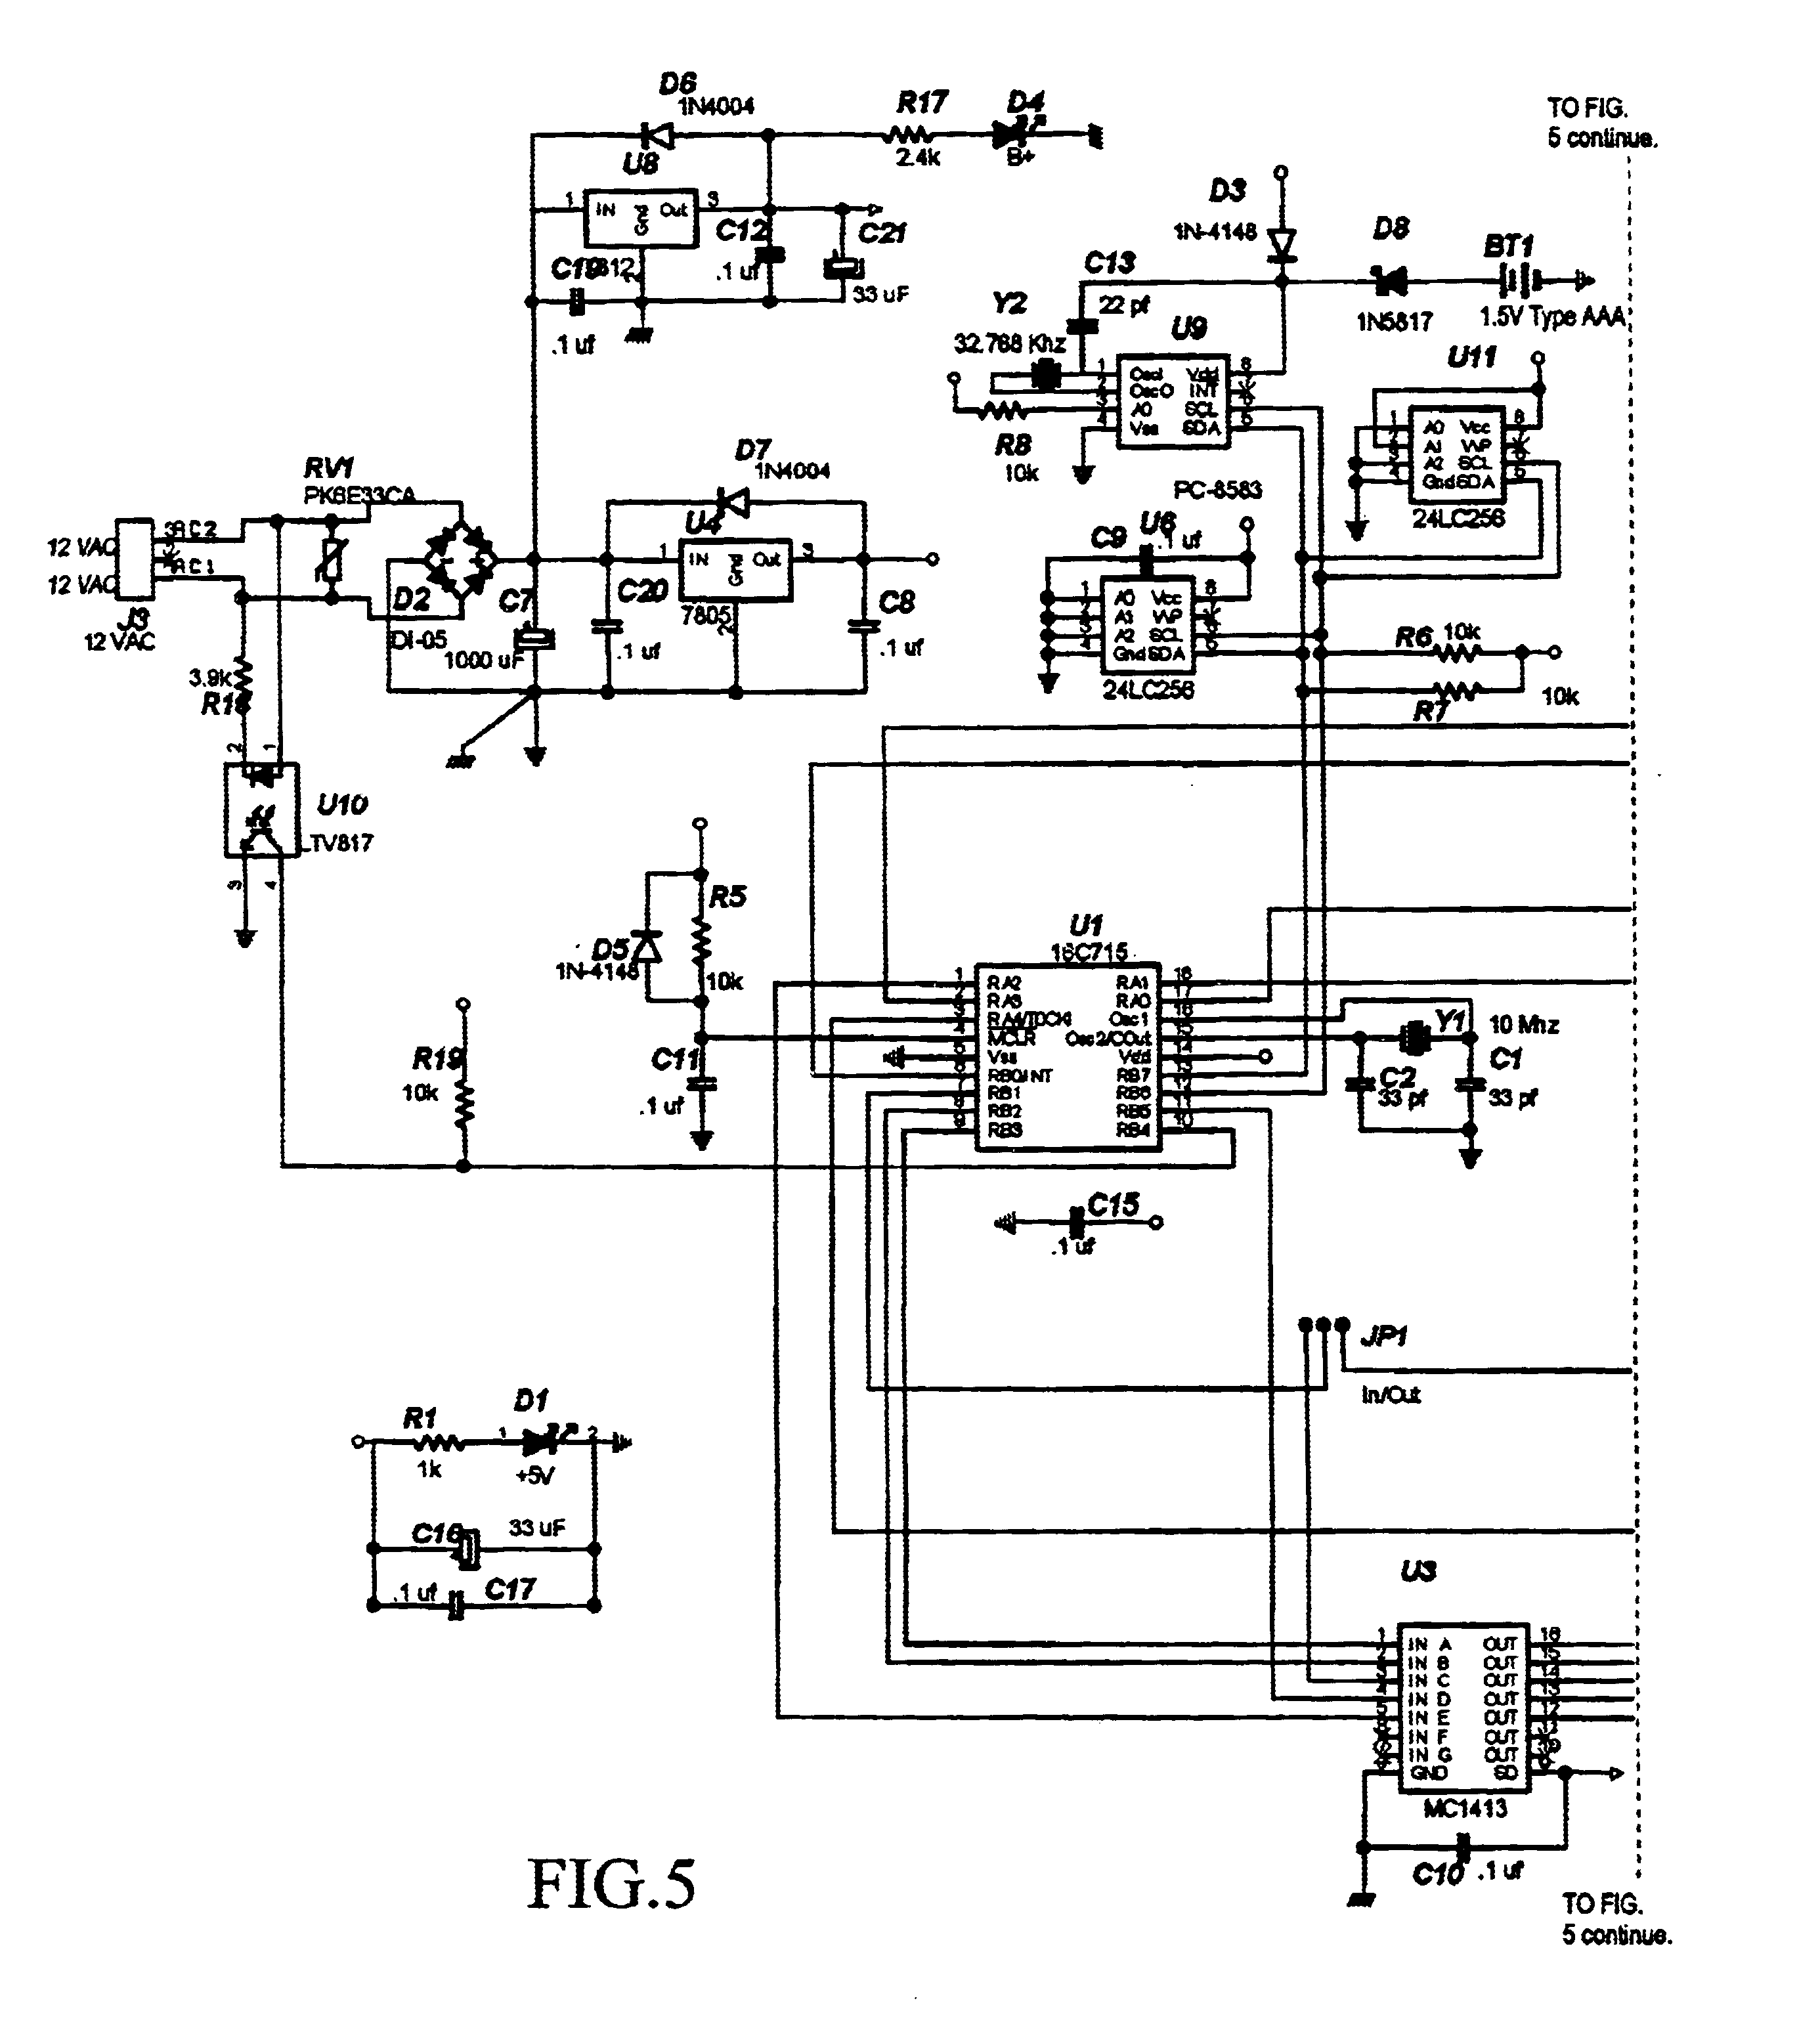 FV_9673] Meyer Sewer Pump Wiring Diagram Free DiagramImpa Sianu Ilari Gray Proe Mohammedshrine Librar Wiring 101